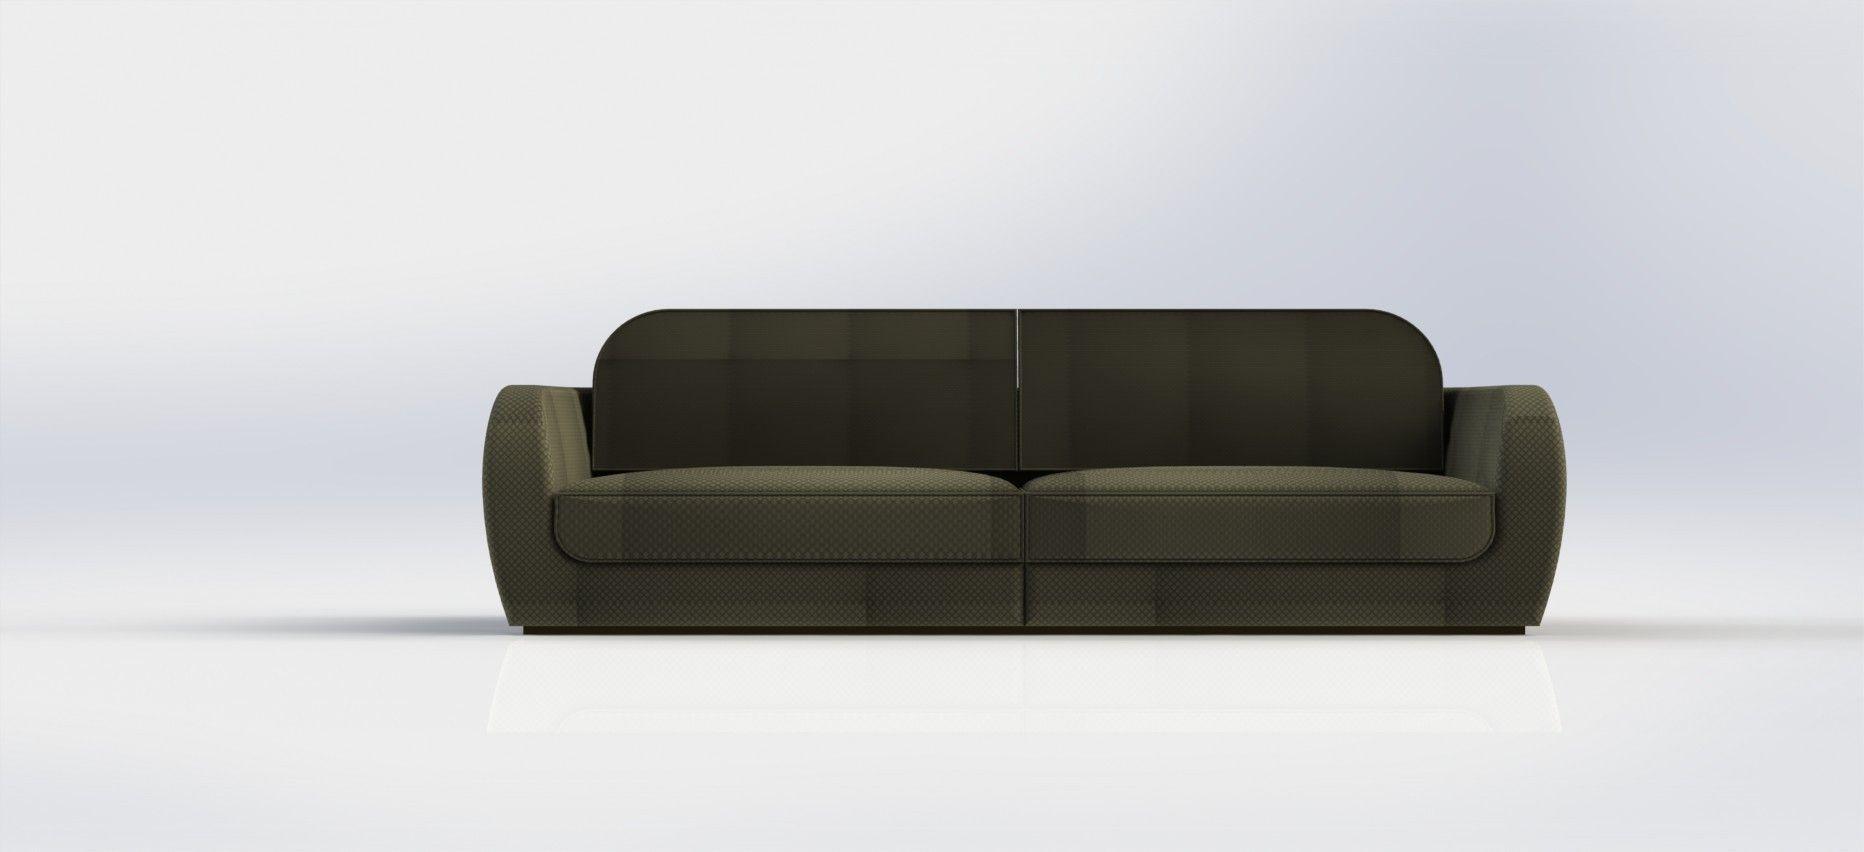 simple modern sofa 3D Model .stl .sldprt .sldasm .slddrw